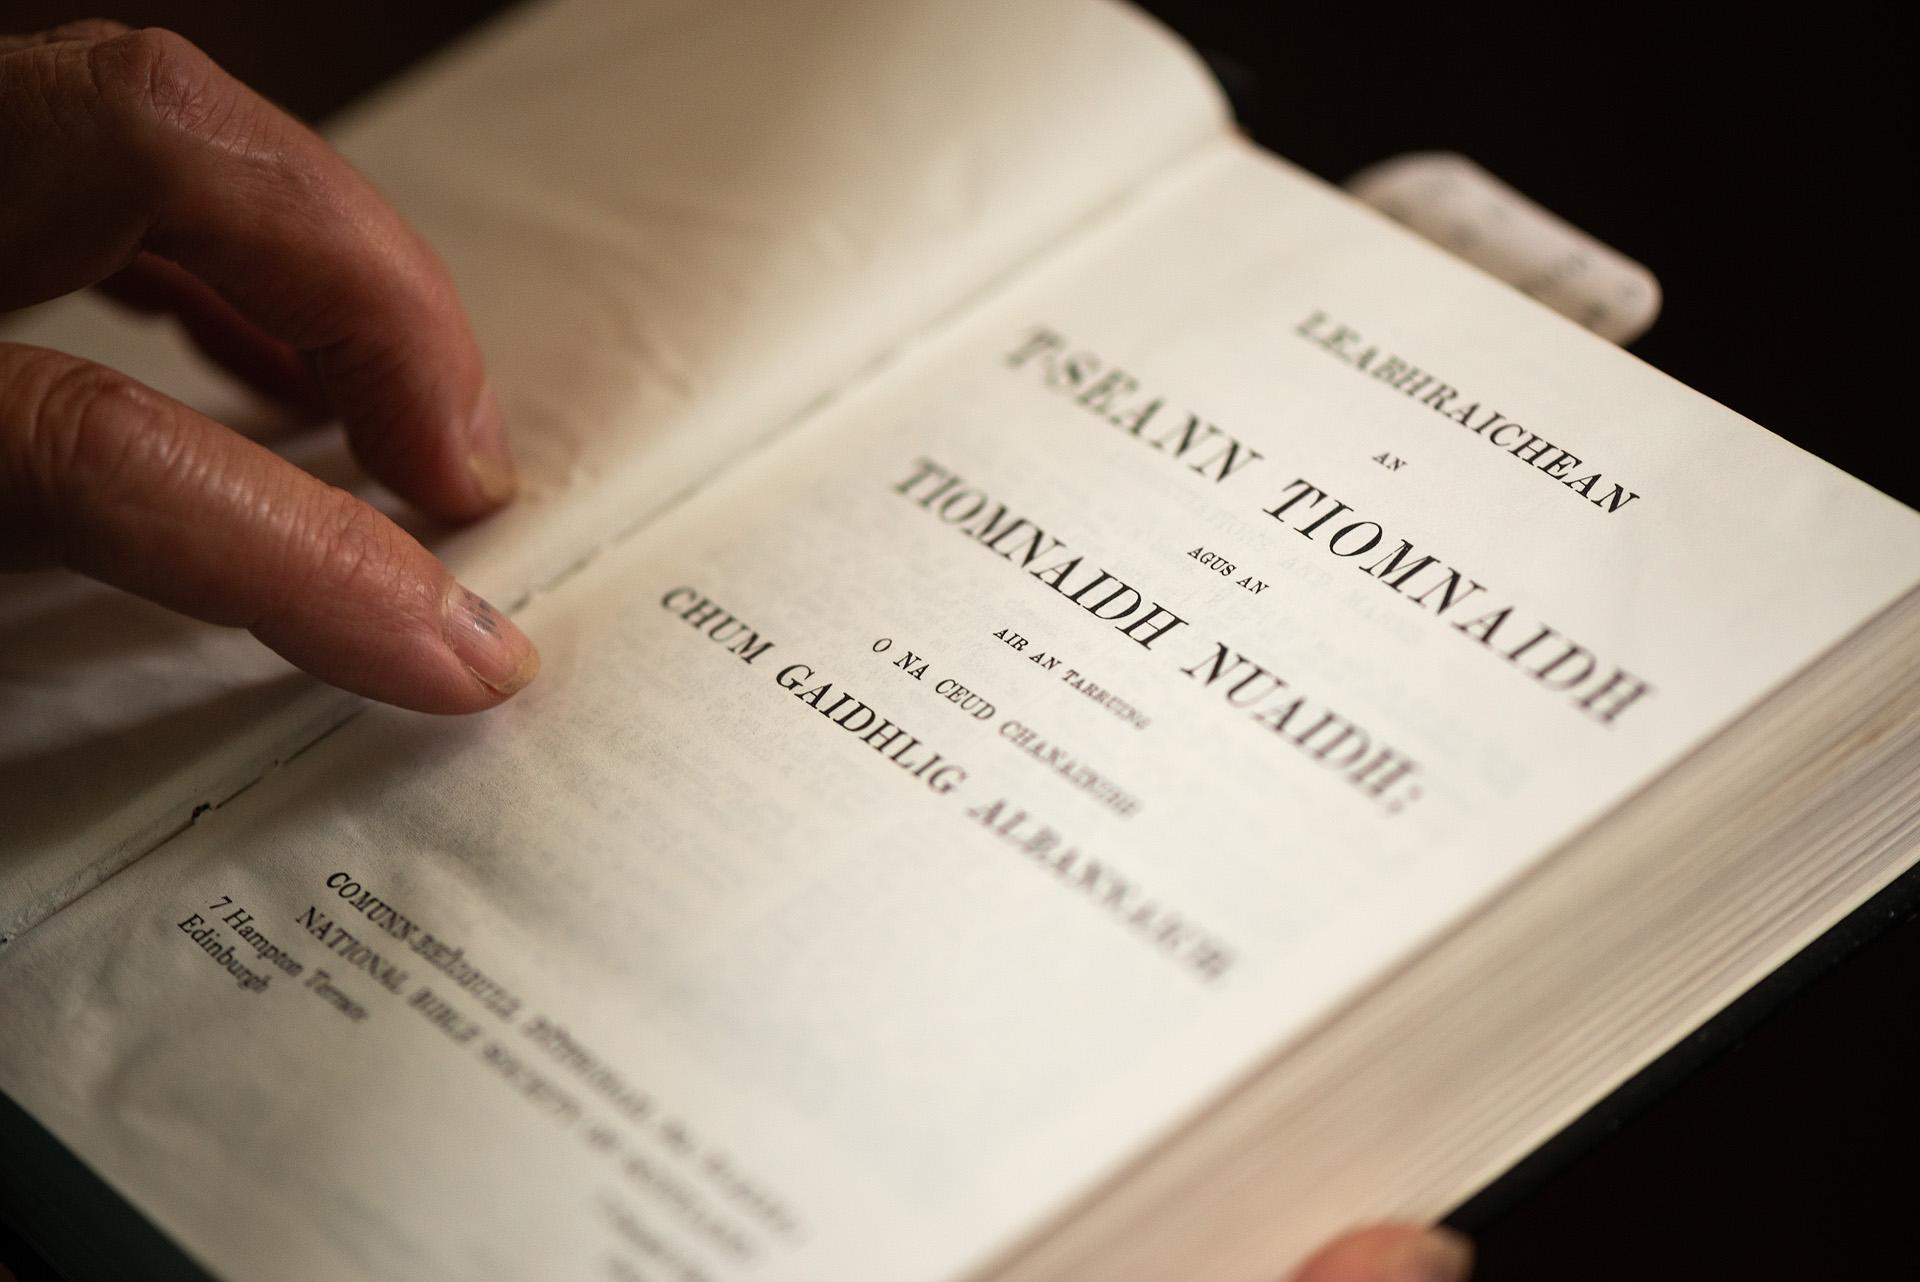 Gaelic Bible in Village Church, St. Kilda